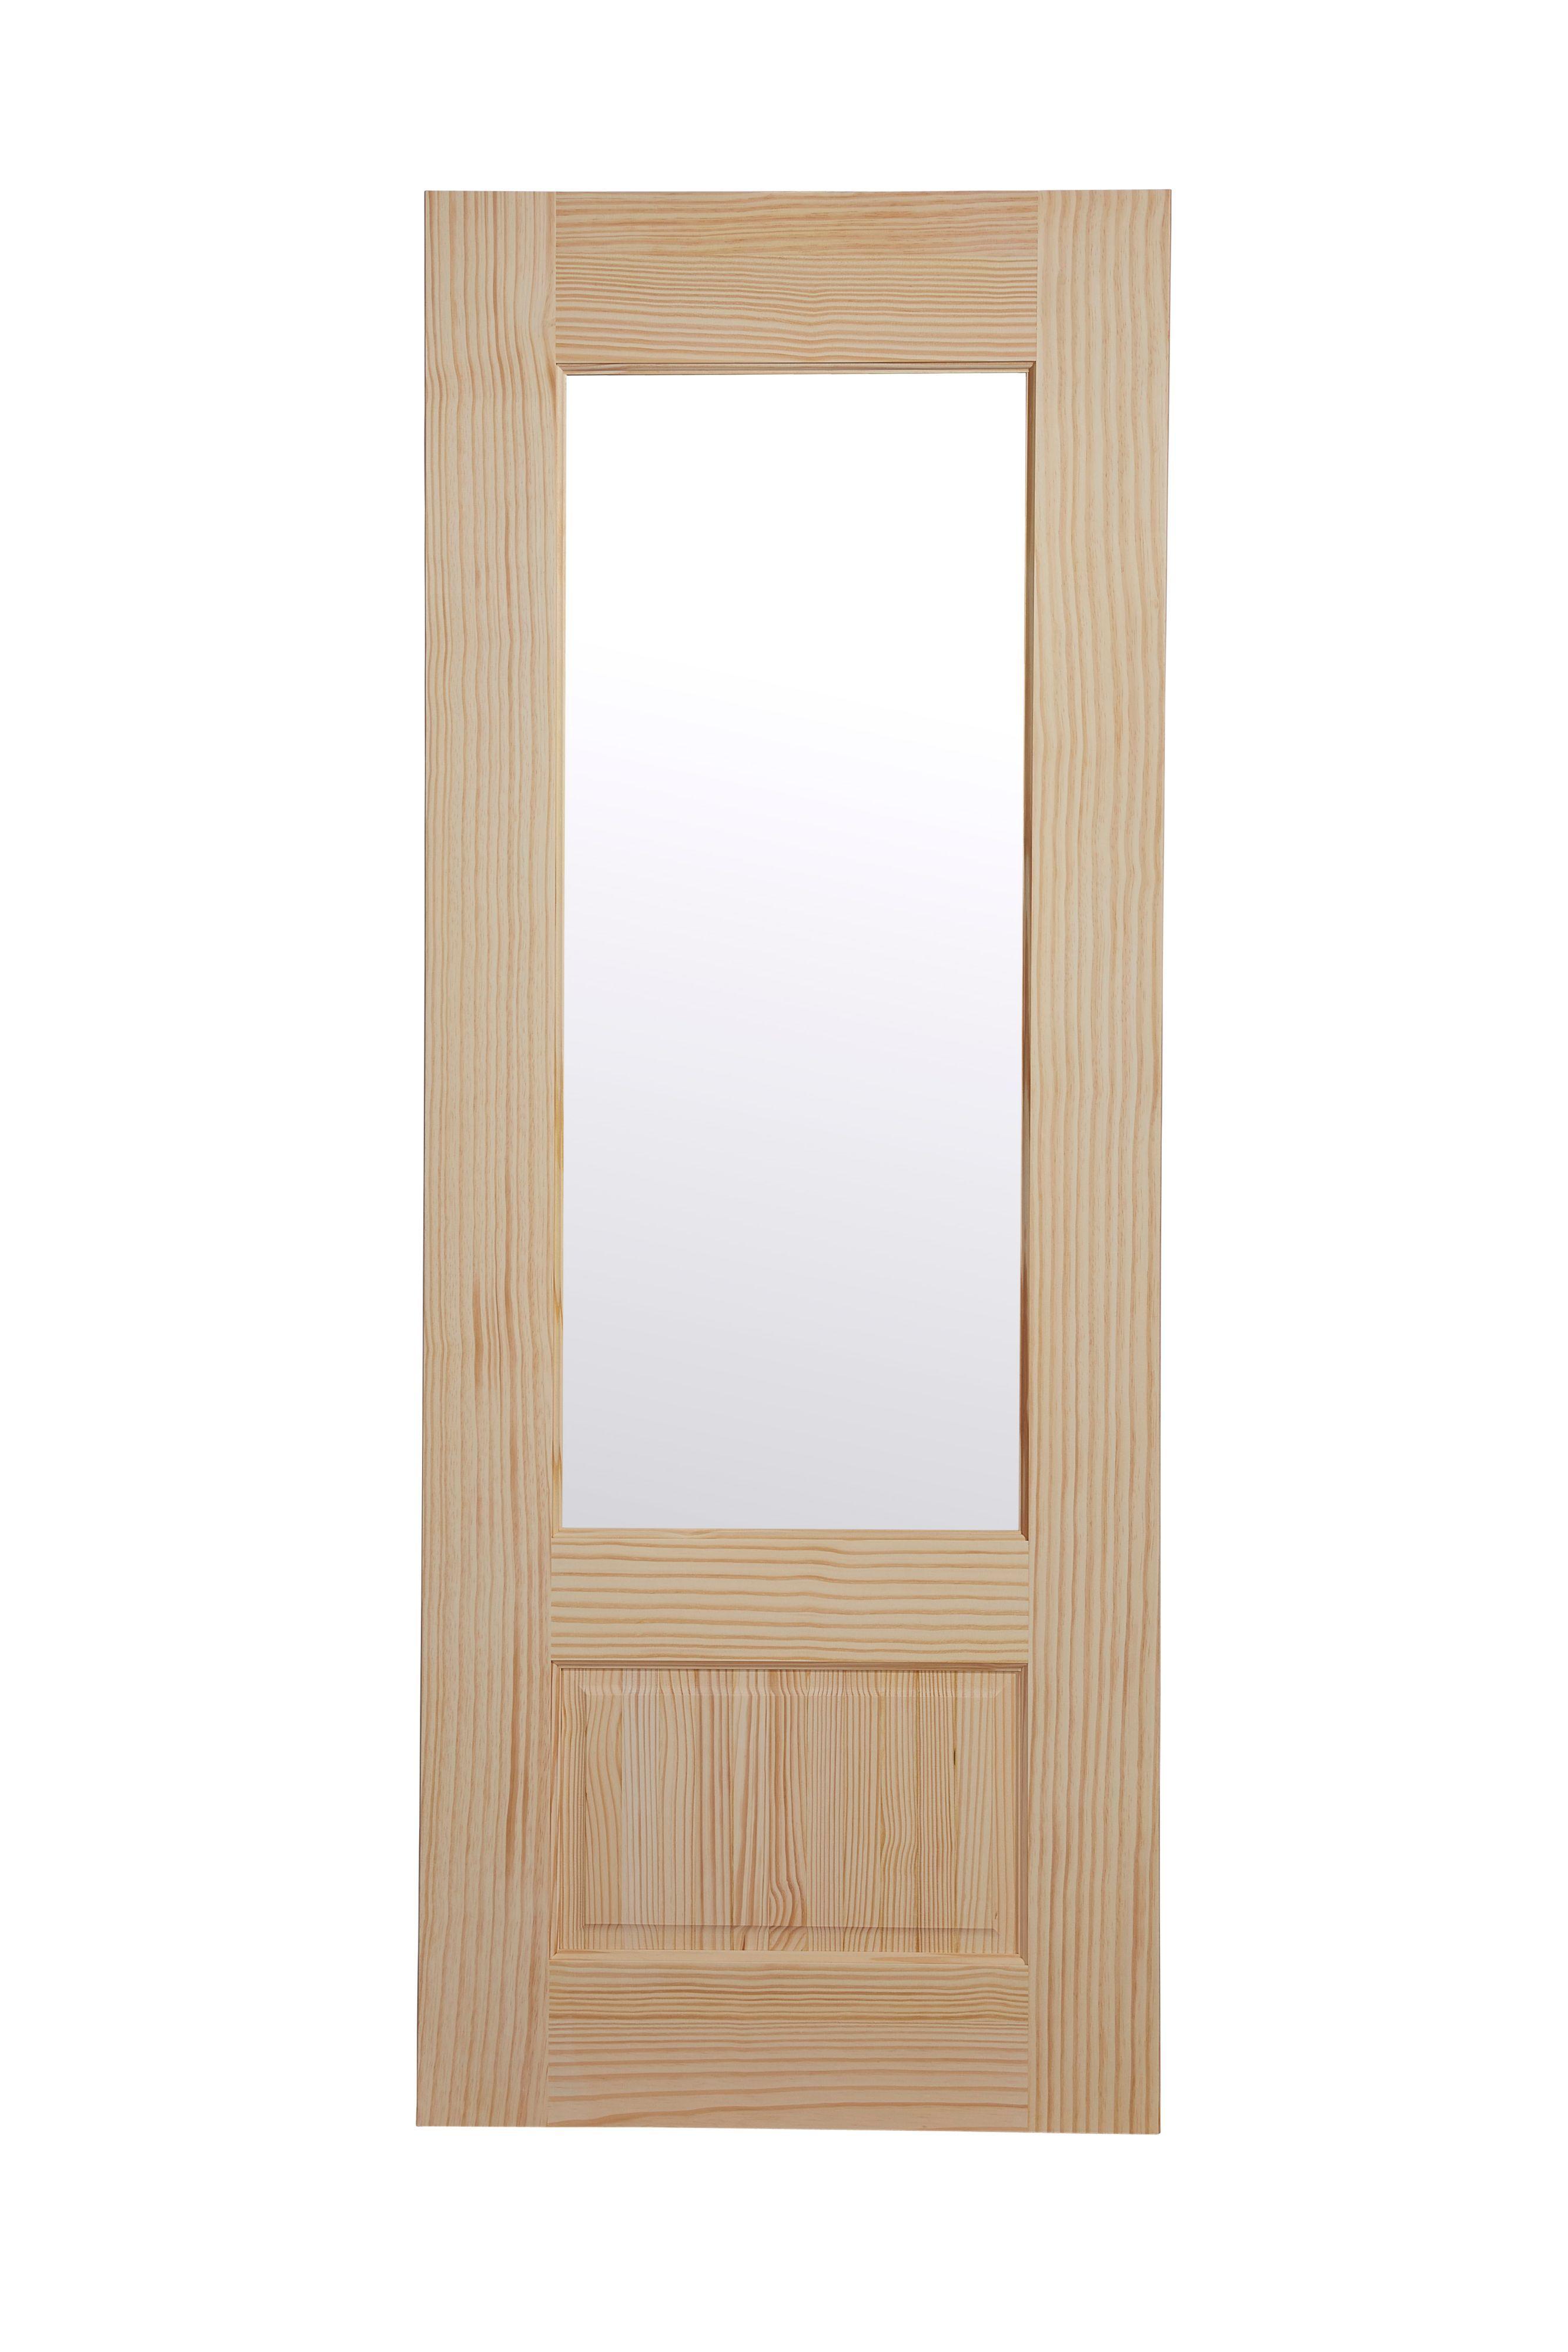 2 Panel Clear Pine Glazed Internal Standard Door H1981mm W686mm